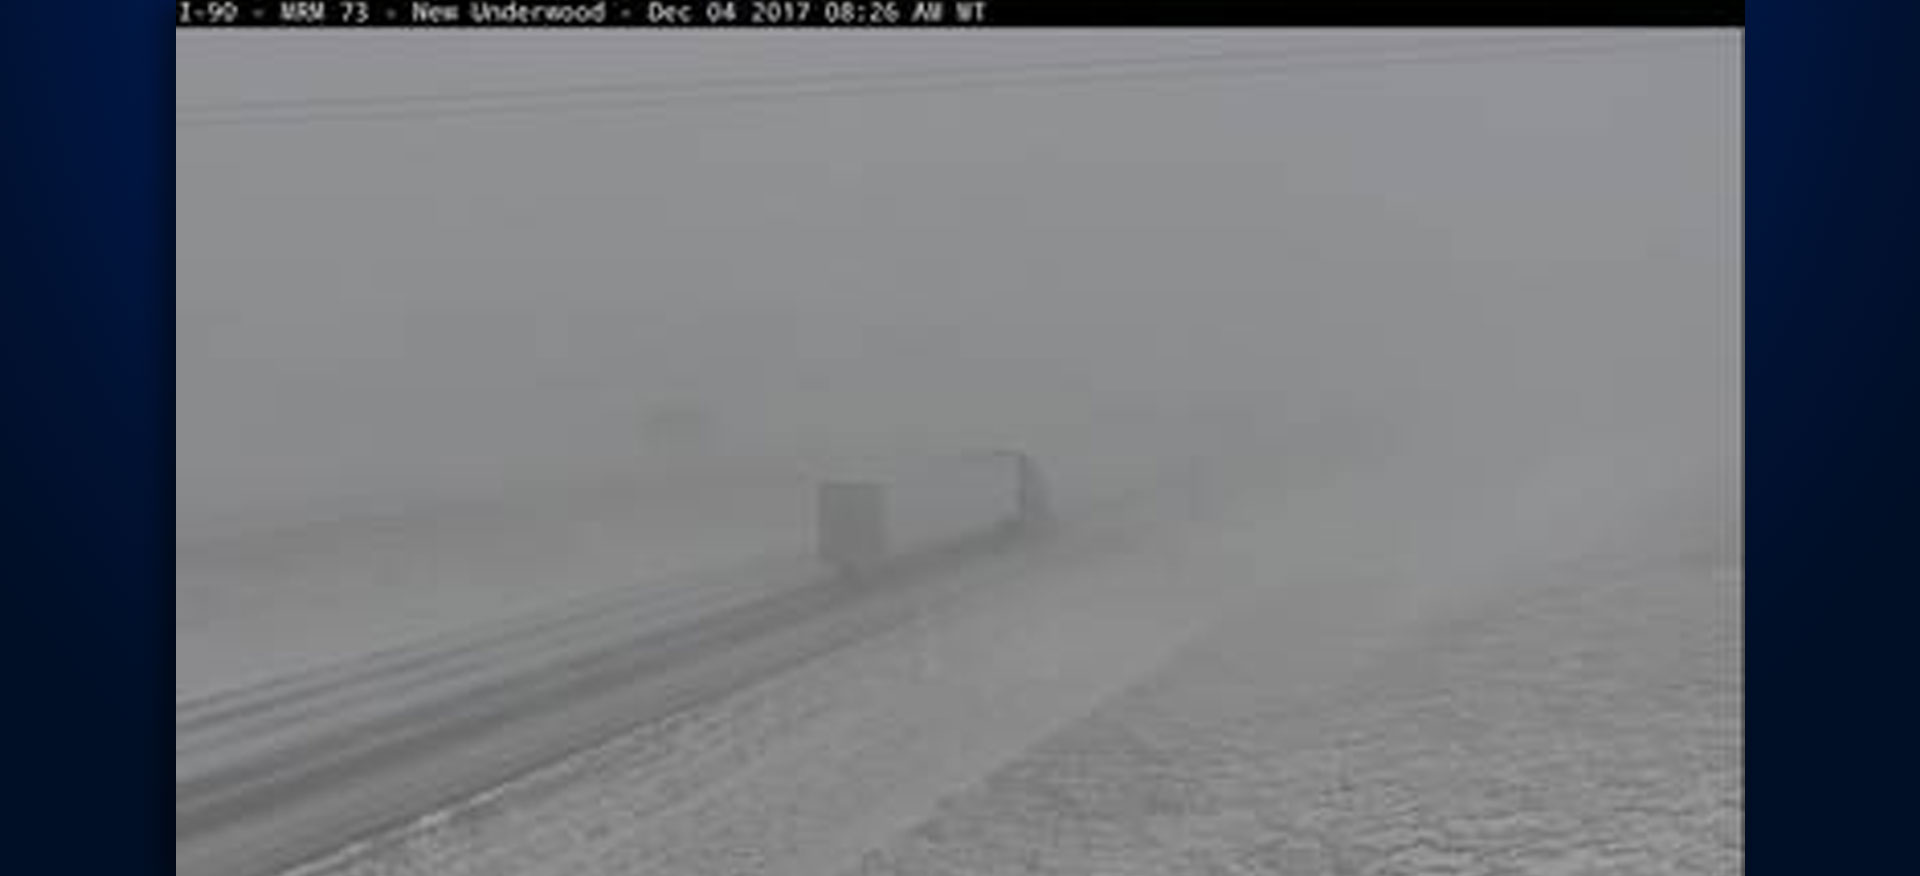 Interstate 90 near Rapid City